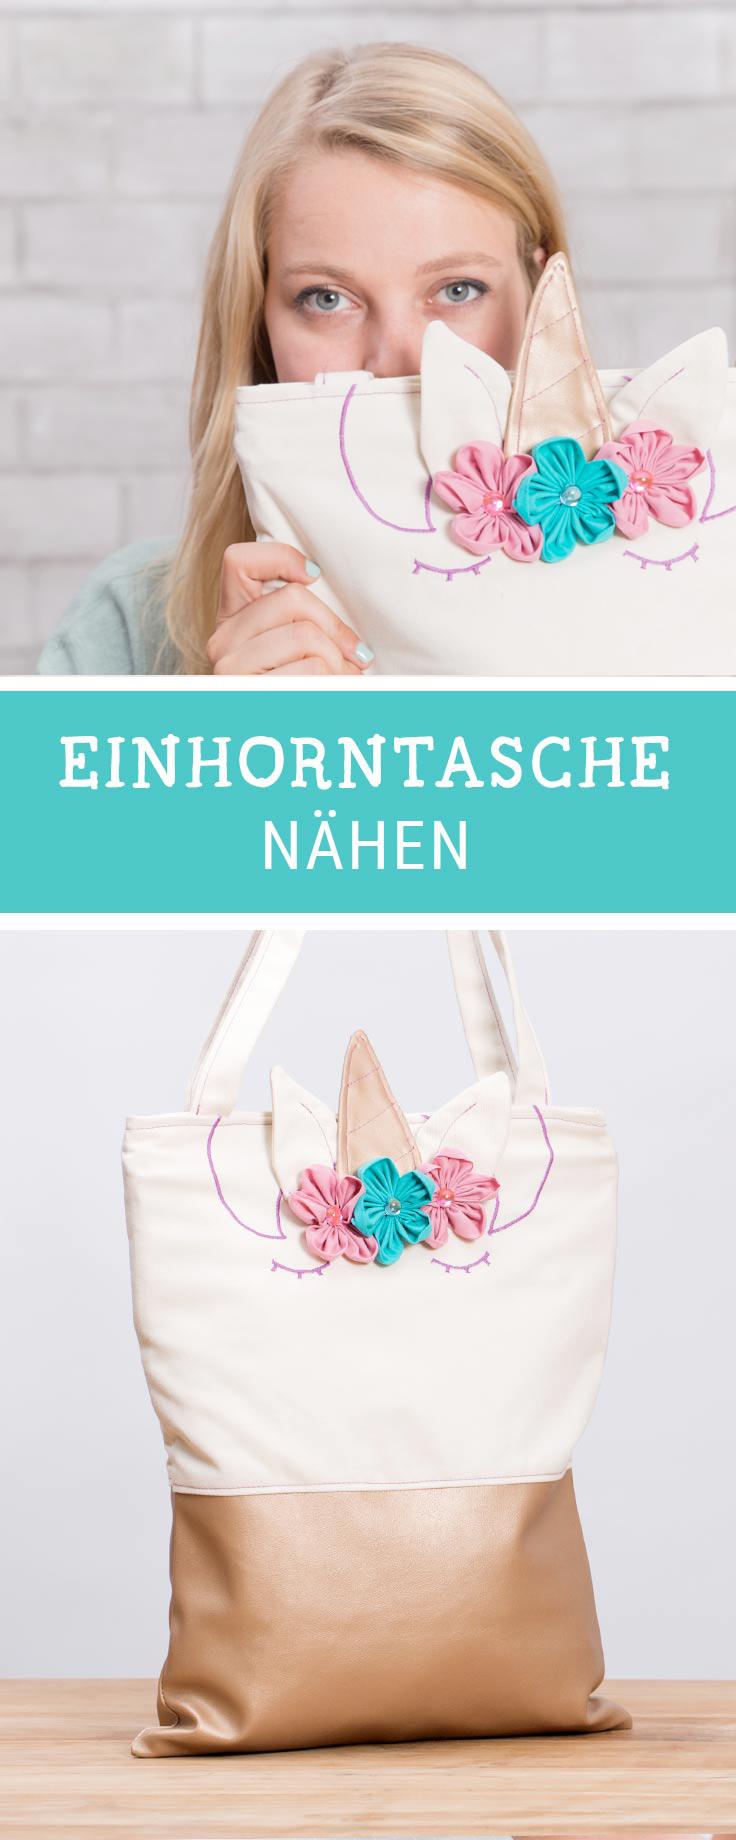 DIY-Anleitung: Niedliche Einhorntasche nähen via DaWanda.com ...